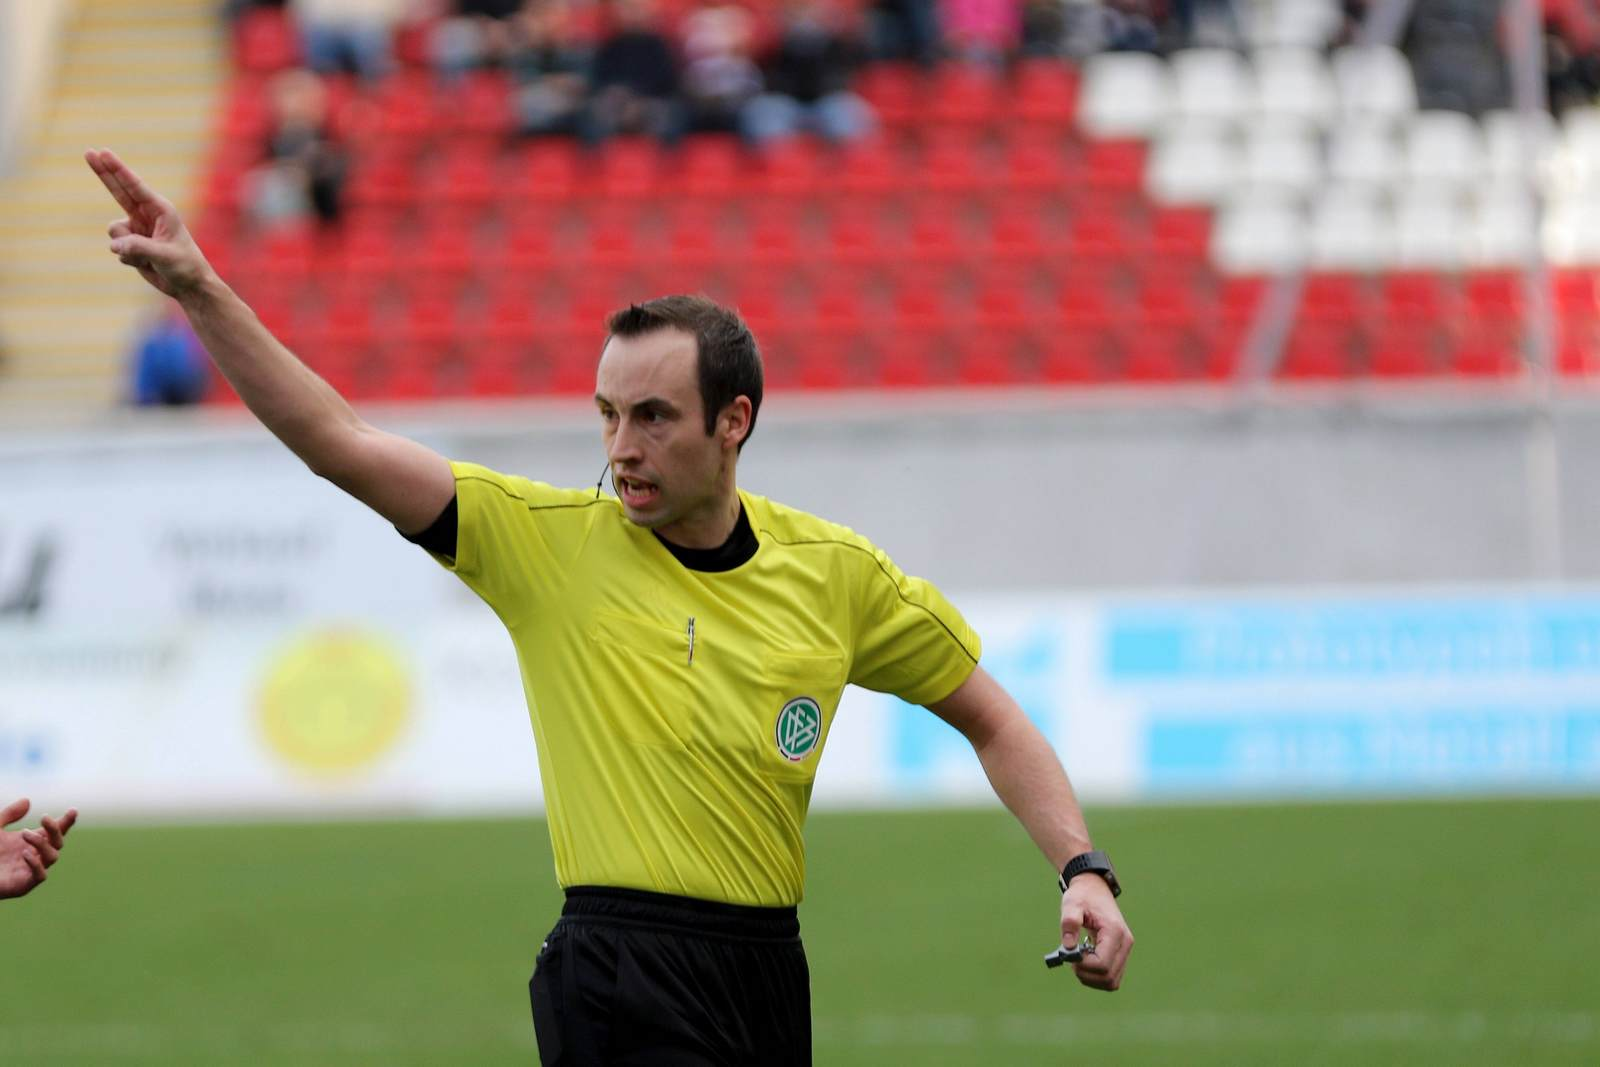 DFB-Schiedsrichter Patrick Alt